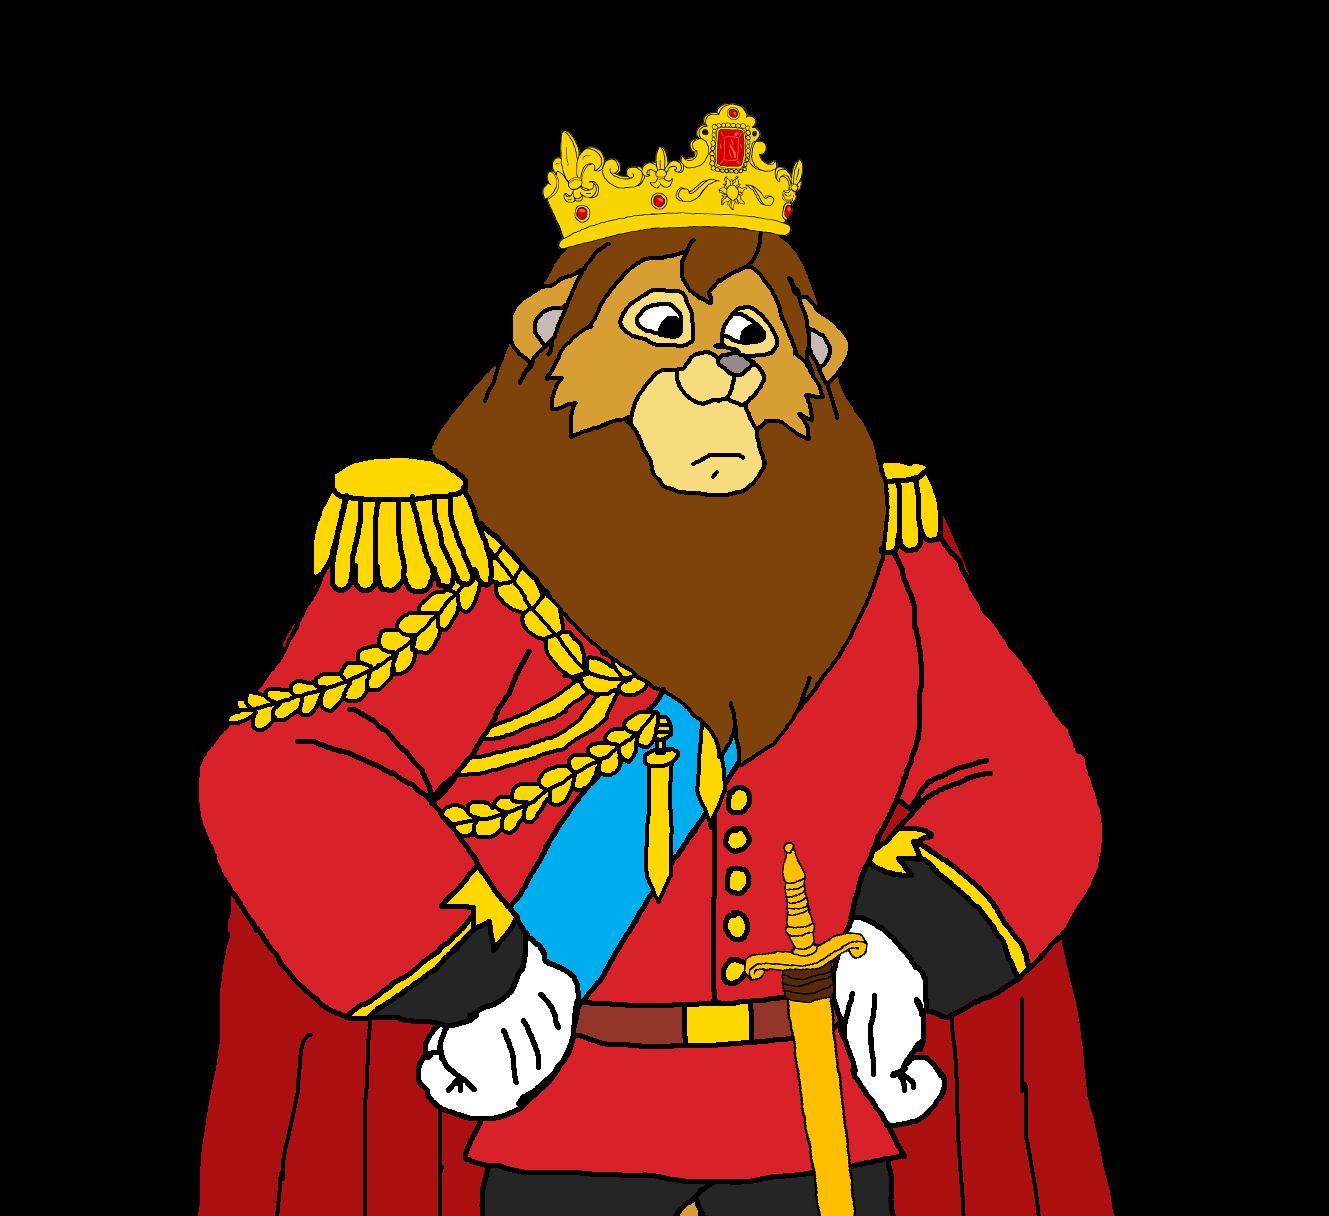 KingLeonLionheart